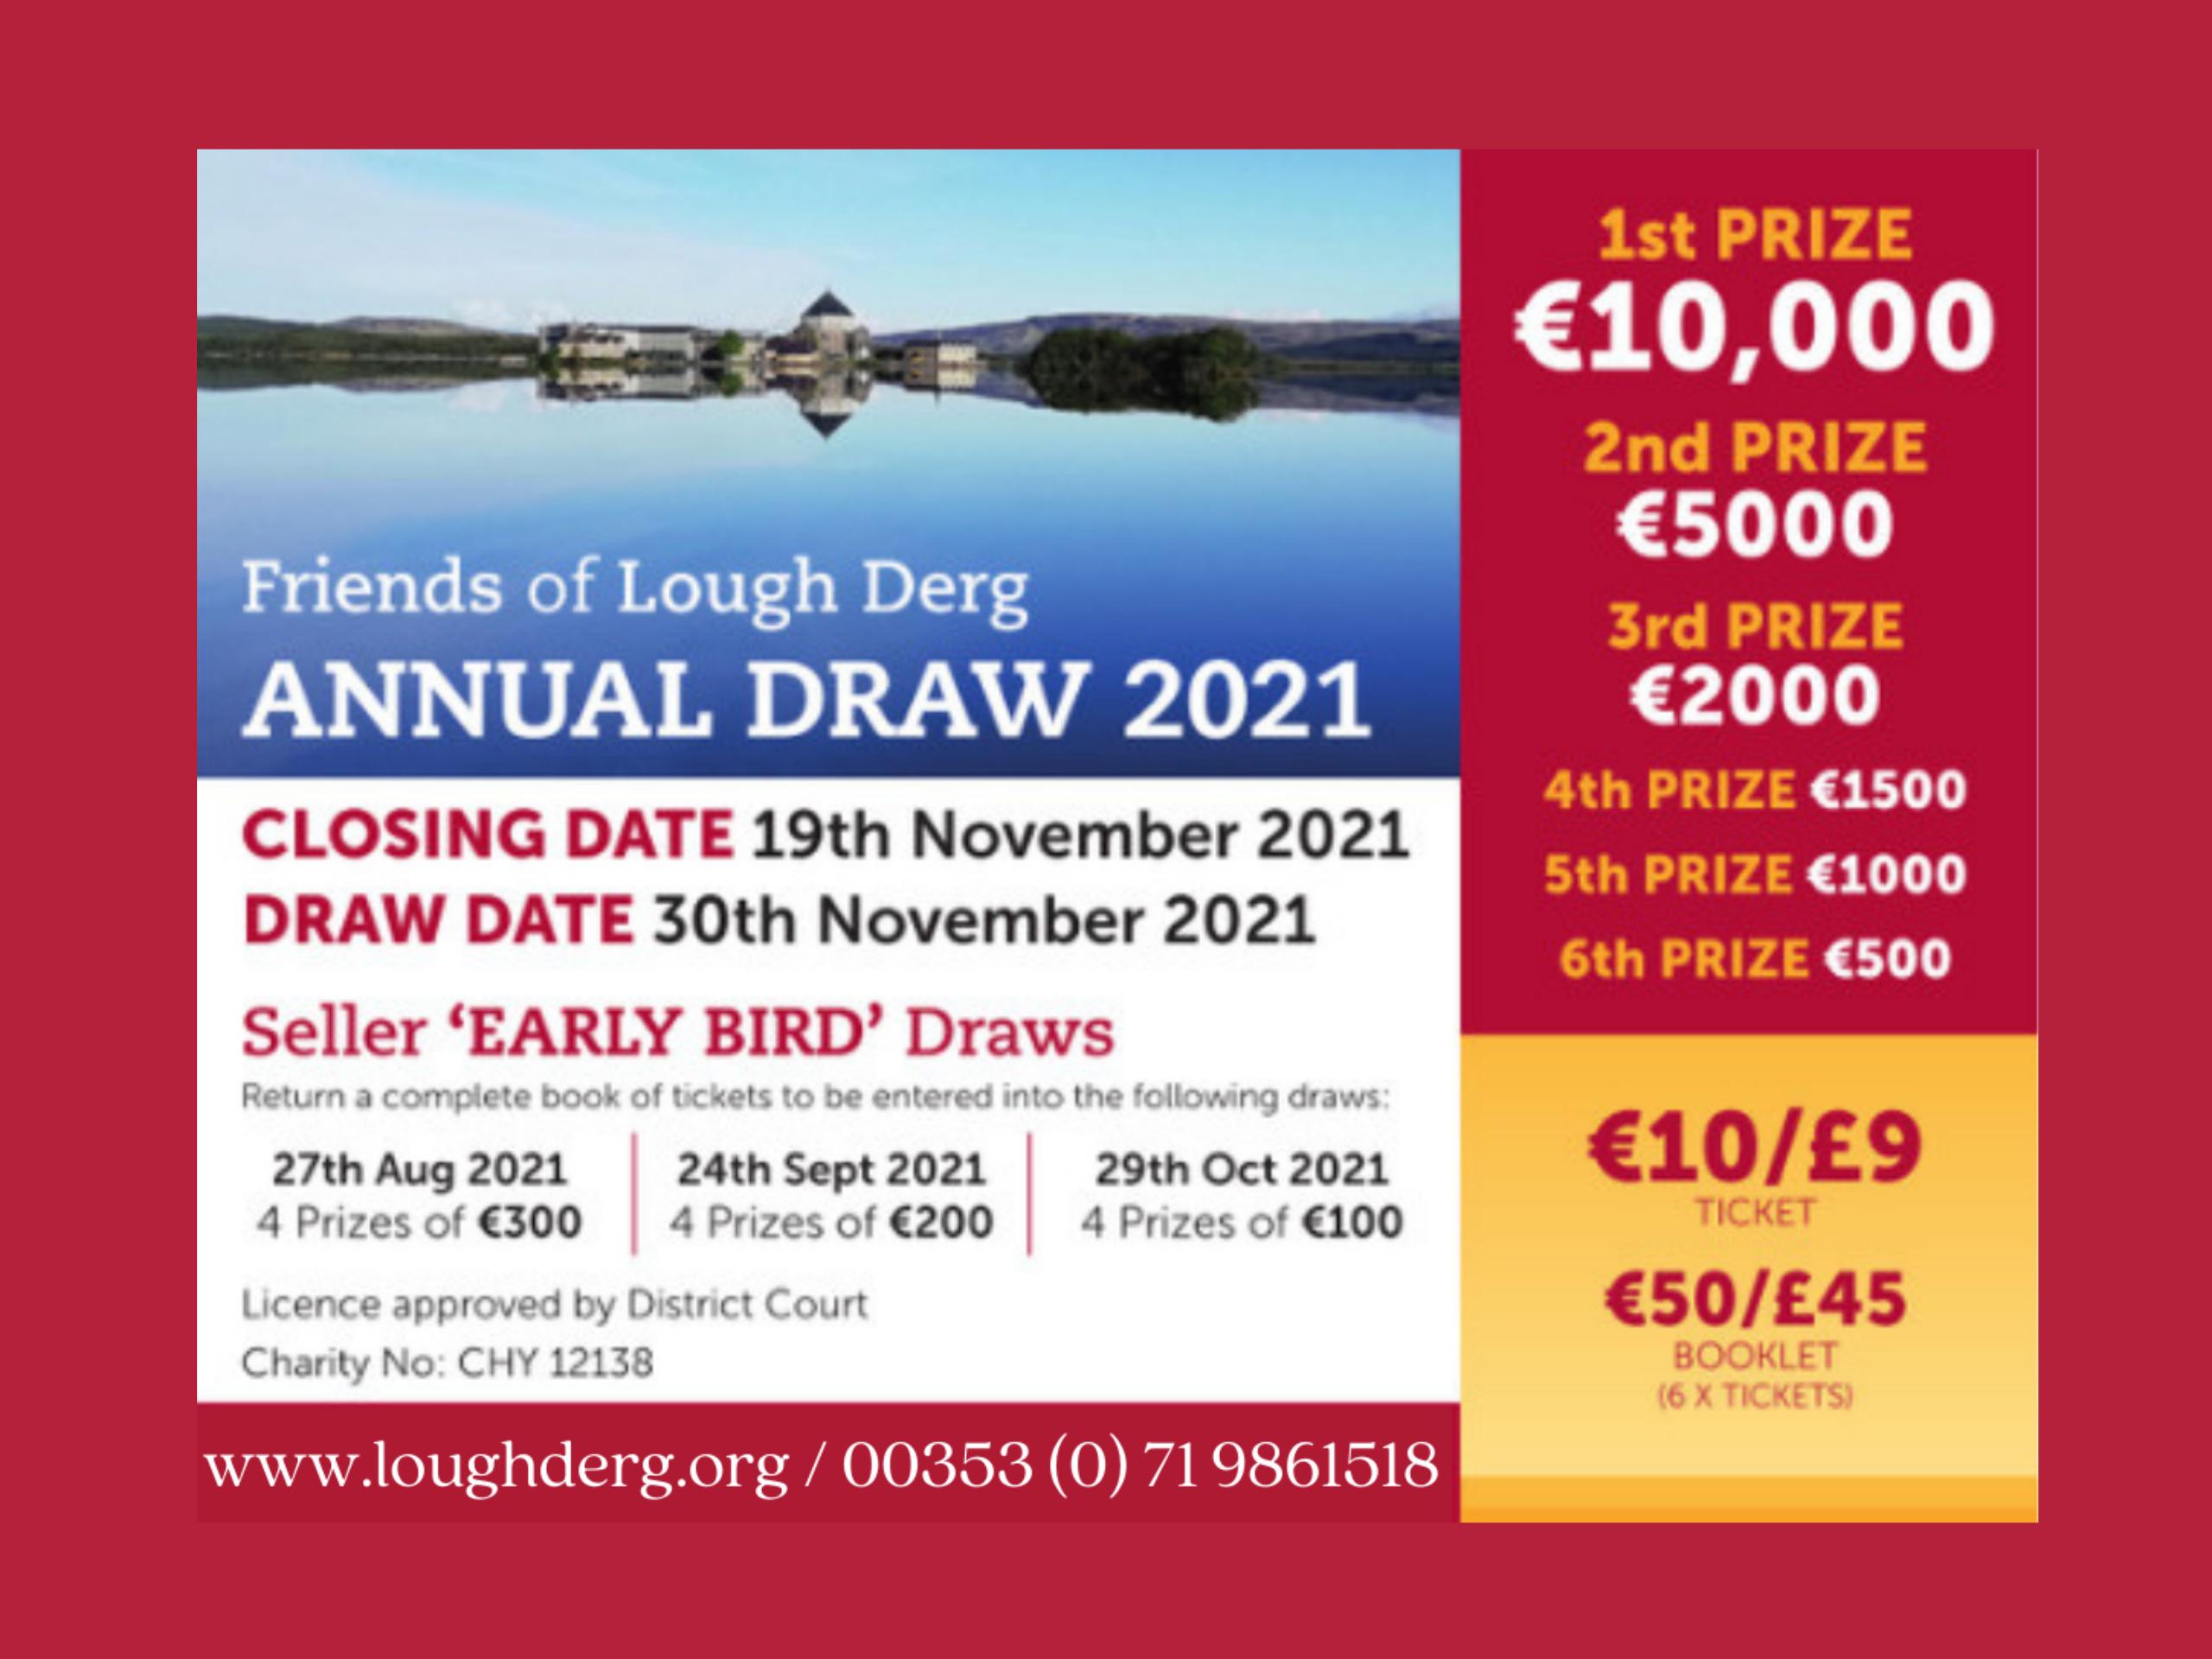 Lough Derg Annual Draw 2021